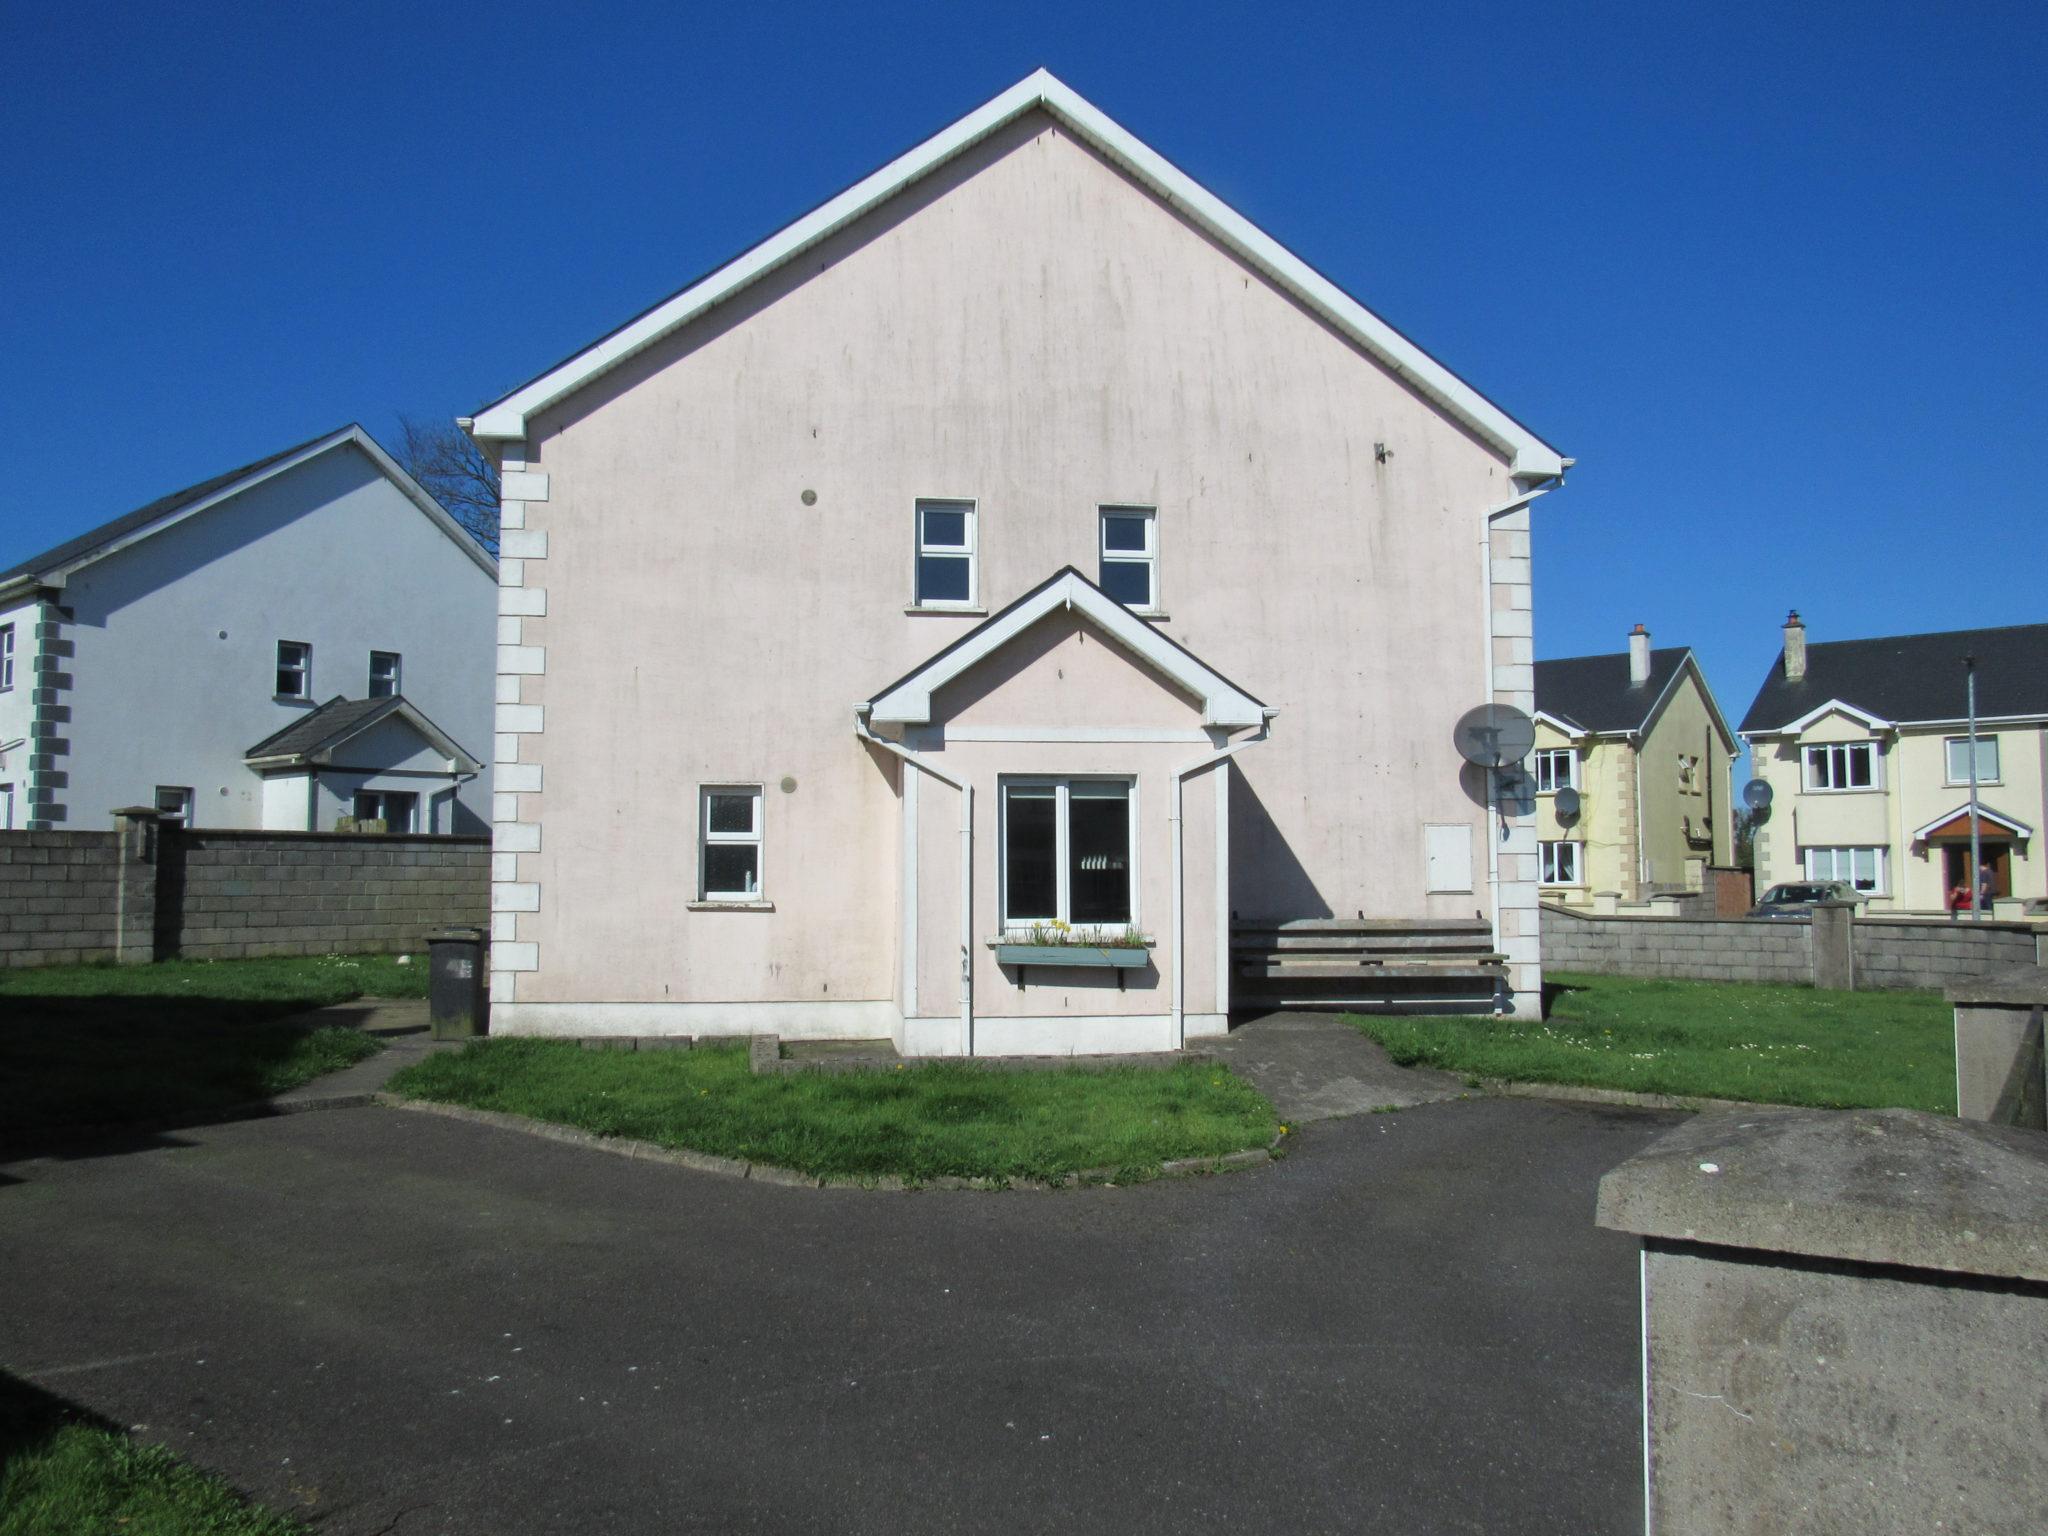 Detached House , 4 Beds – 2 baths 48 Beechwood Park , Granard ,Co.Longford  N39YE20